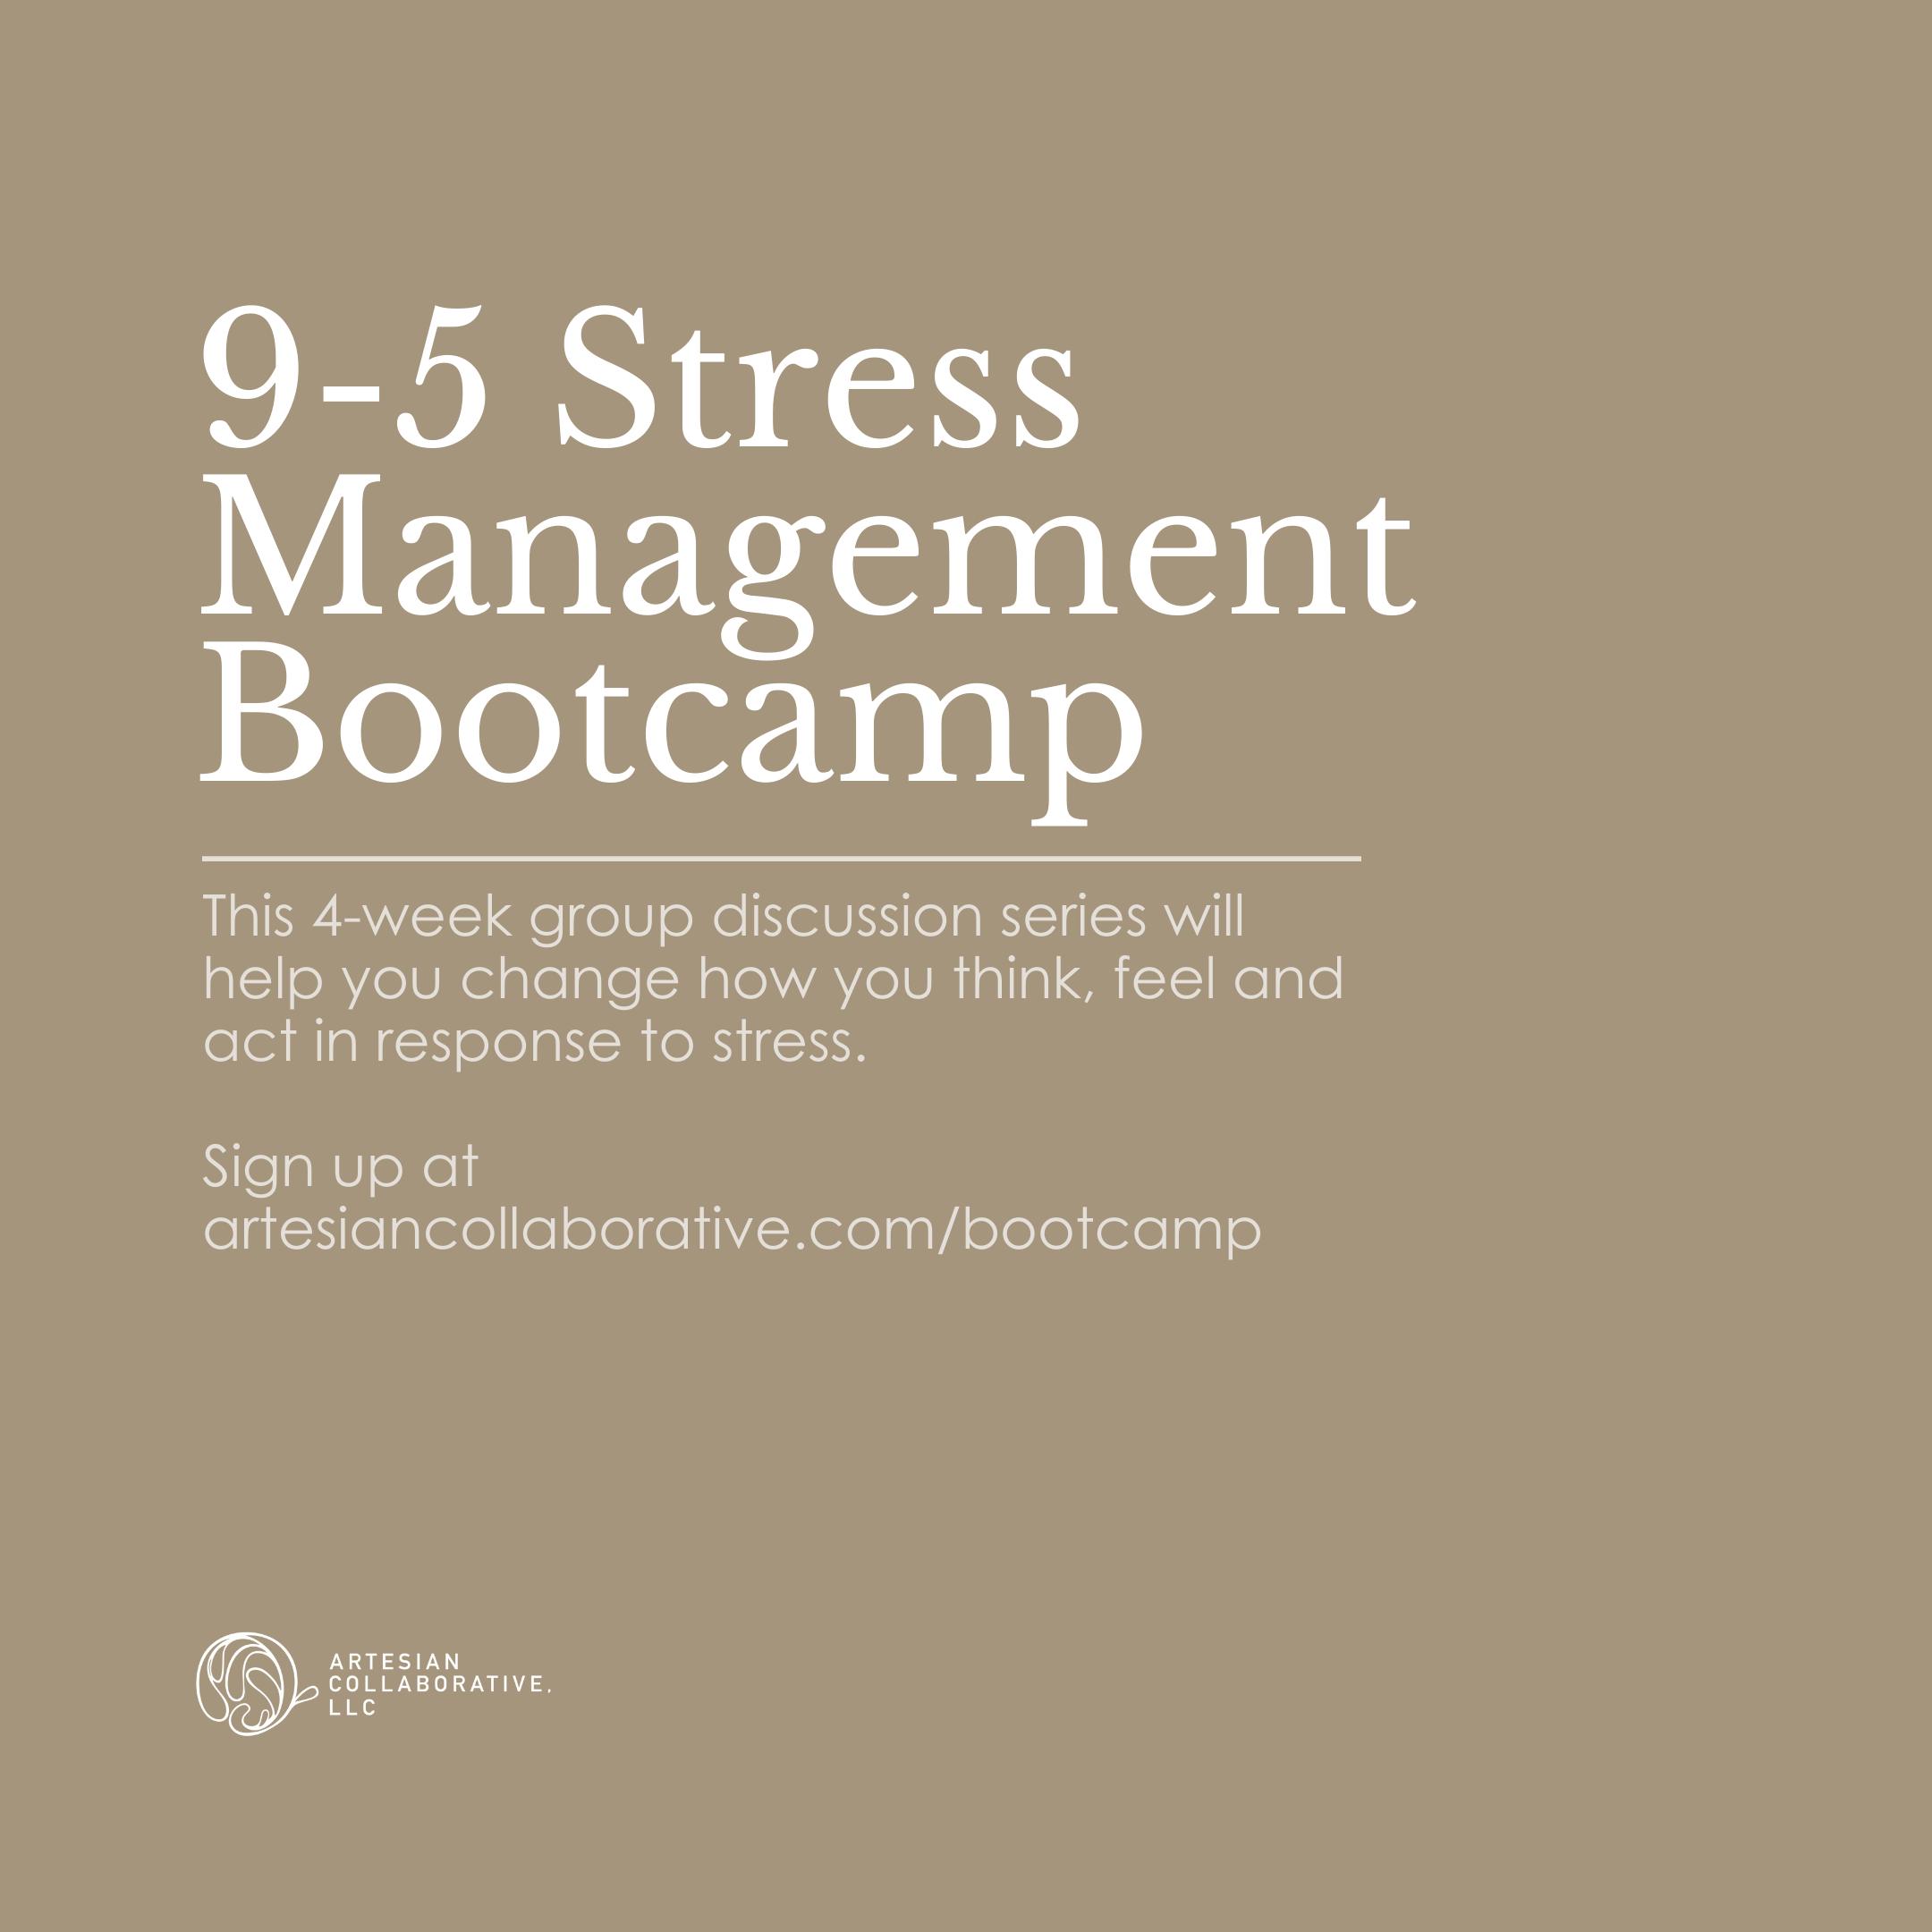 Surviving the  9-5 Stress Management Bootcamp